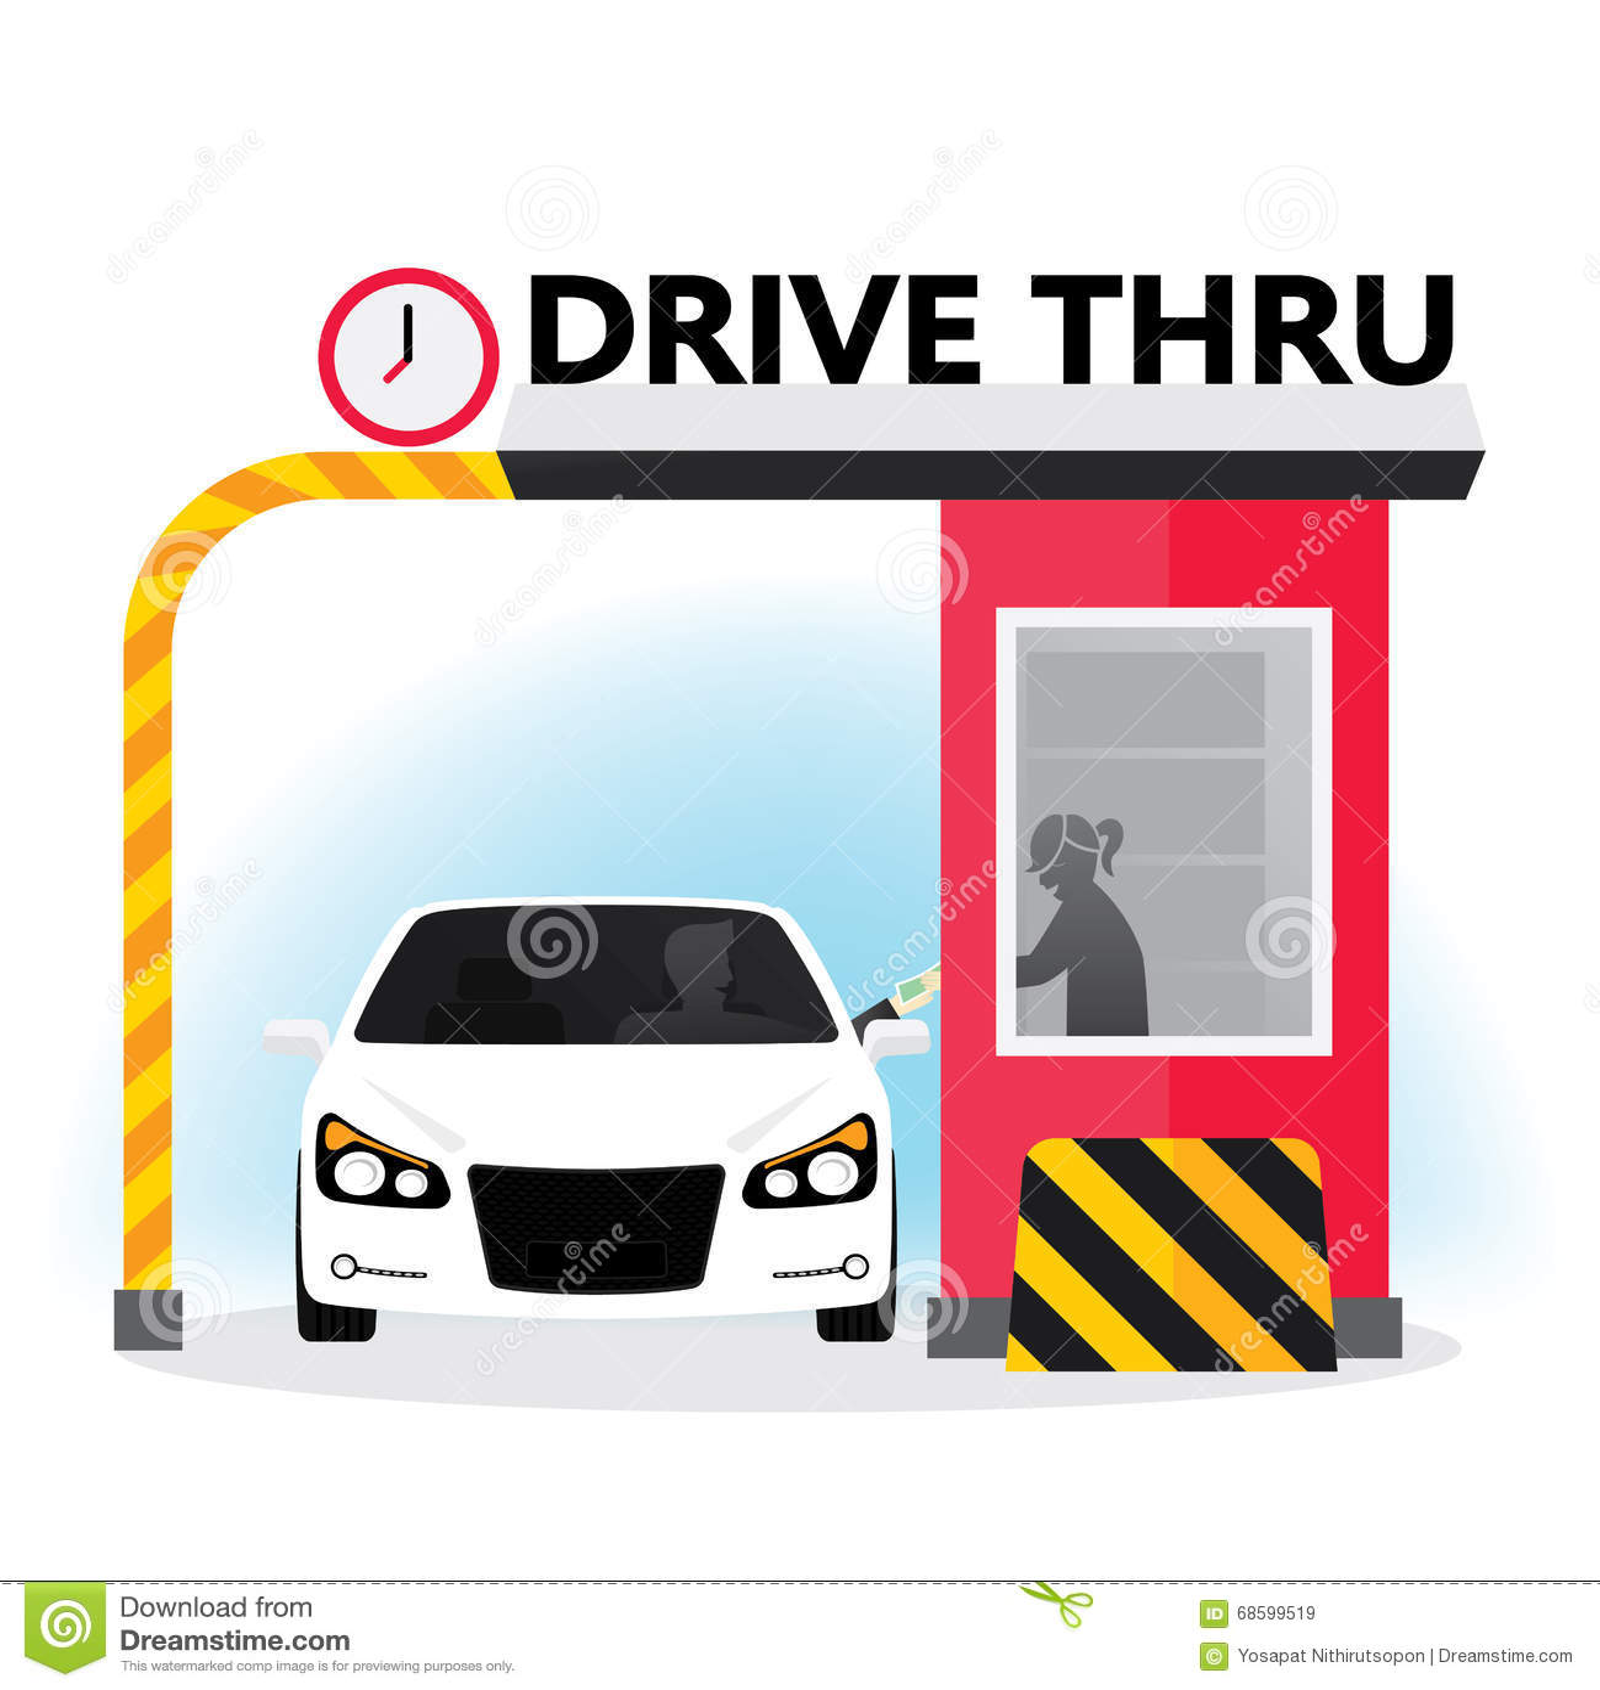 how to work drive thru